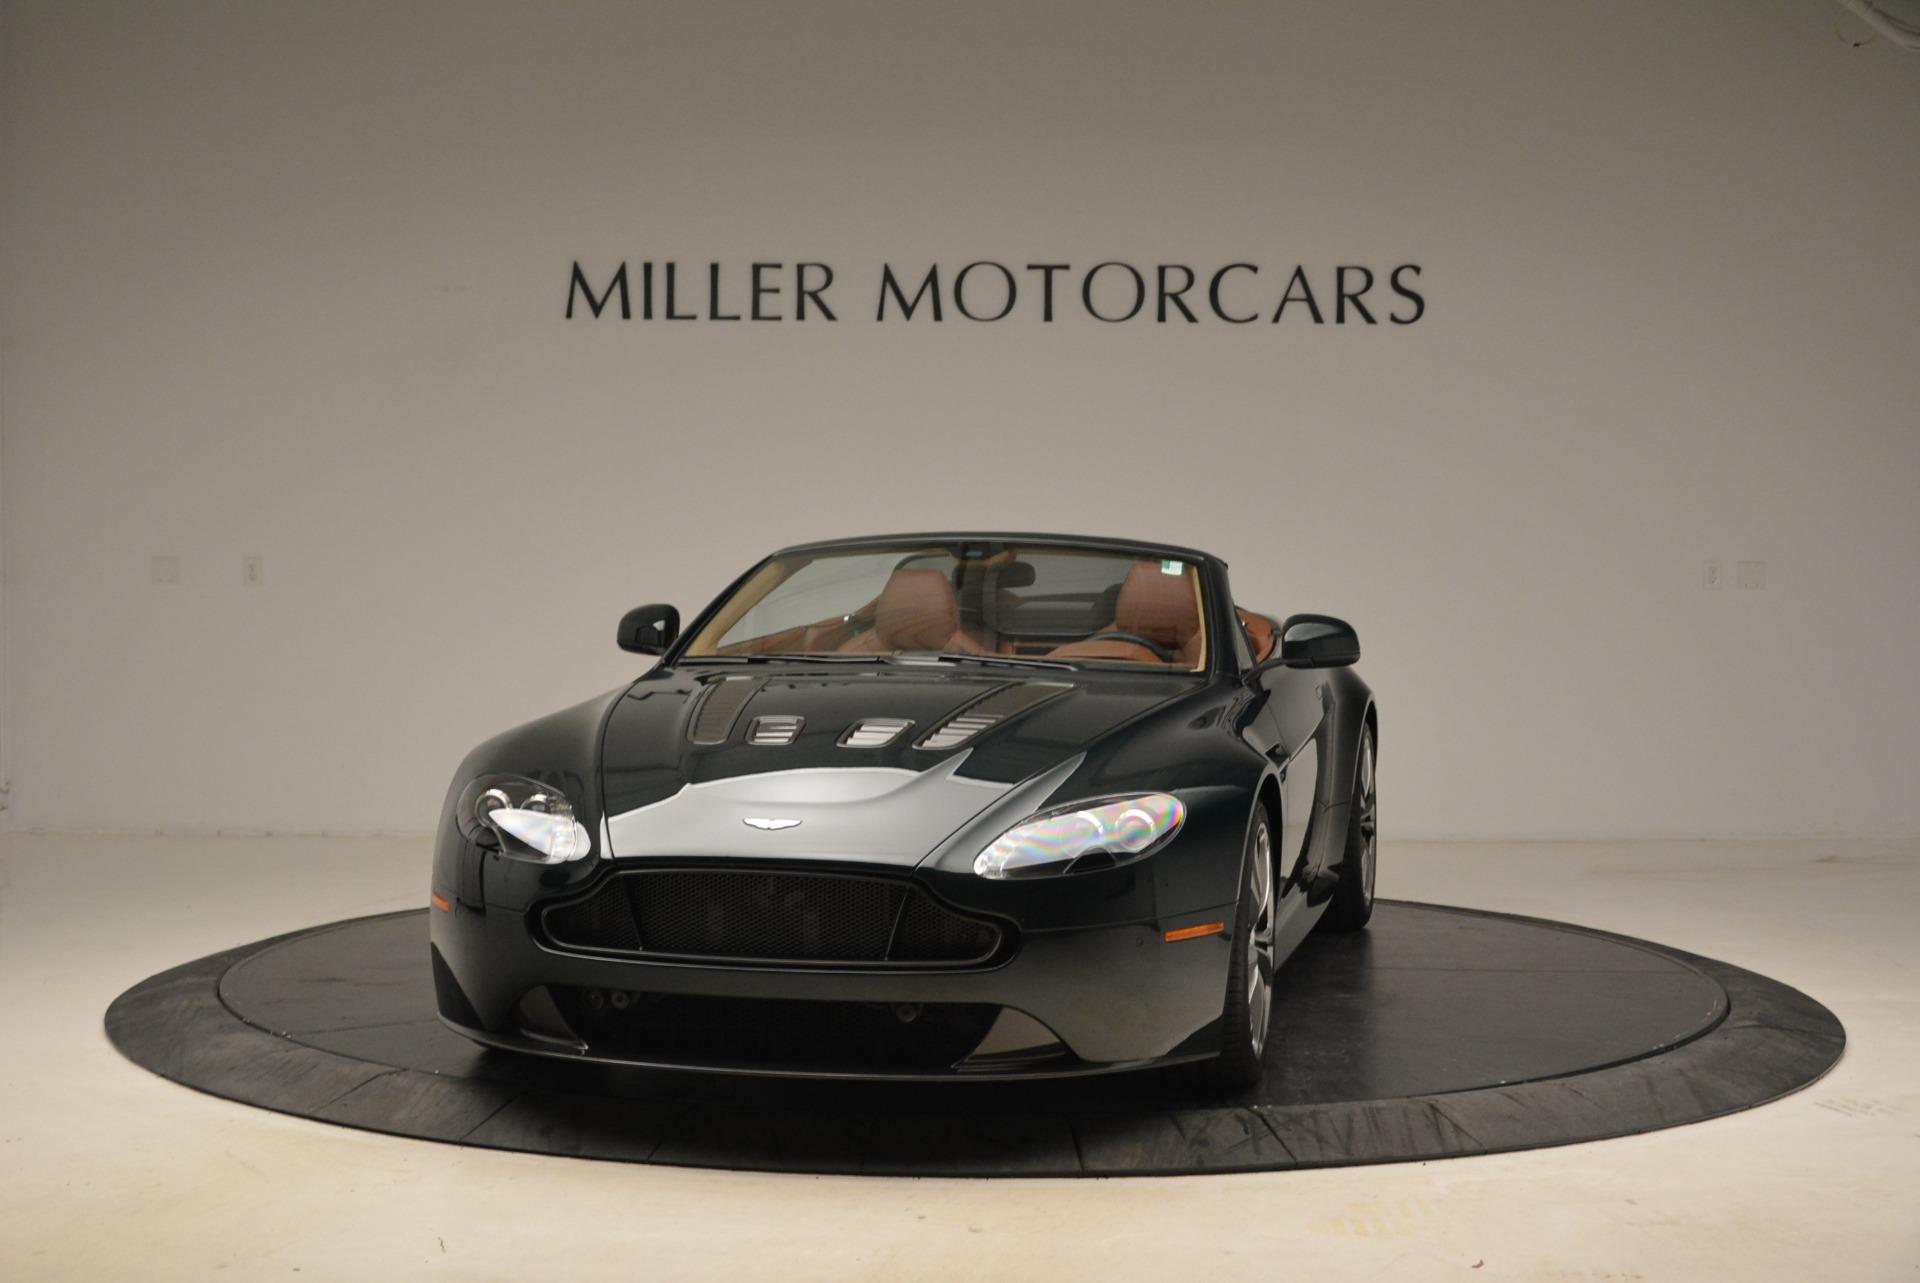 Used 2017 Aston Martin V12 Vantage S Roadster for sale Sold at Bugatti of Greenwich in Greenwich CT 06830 1